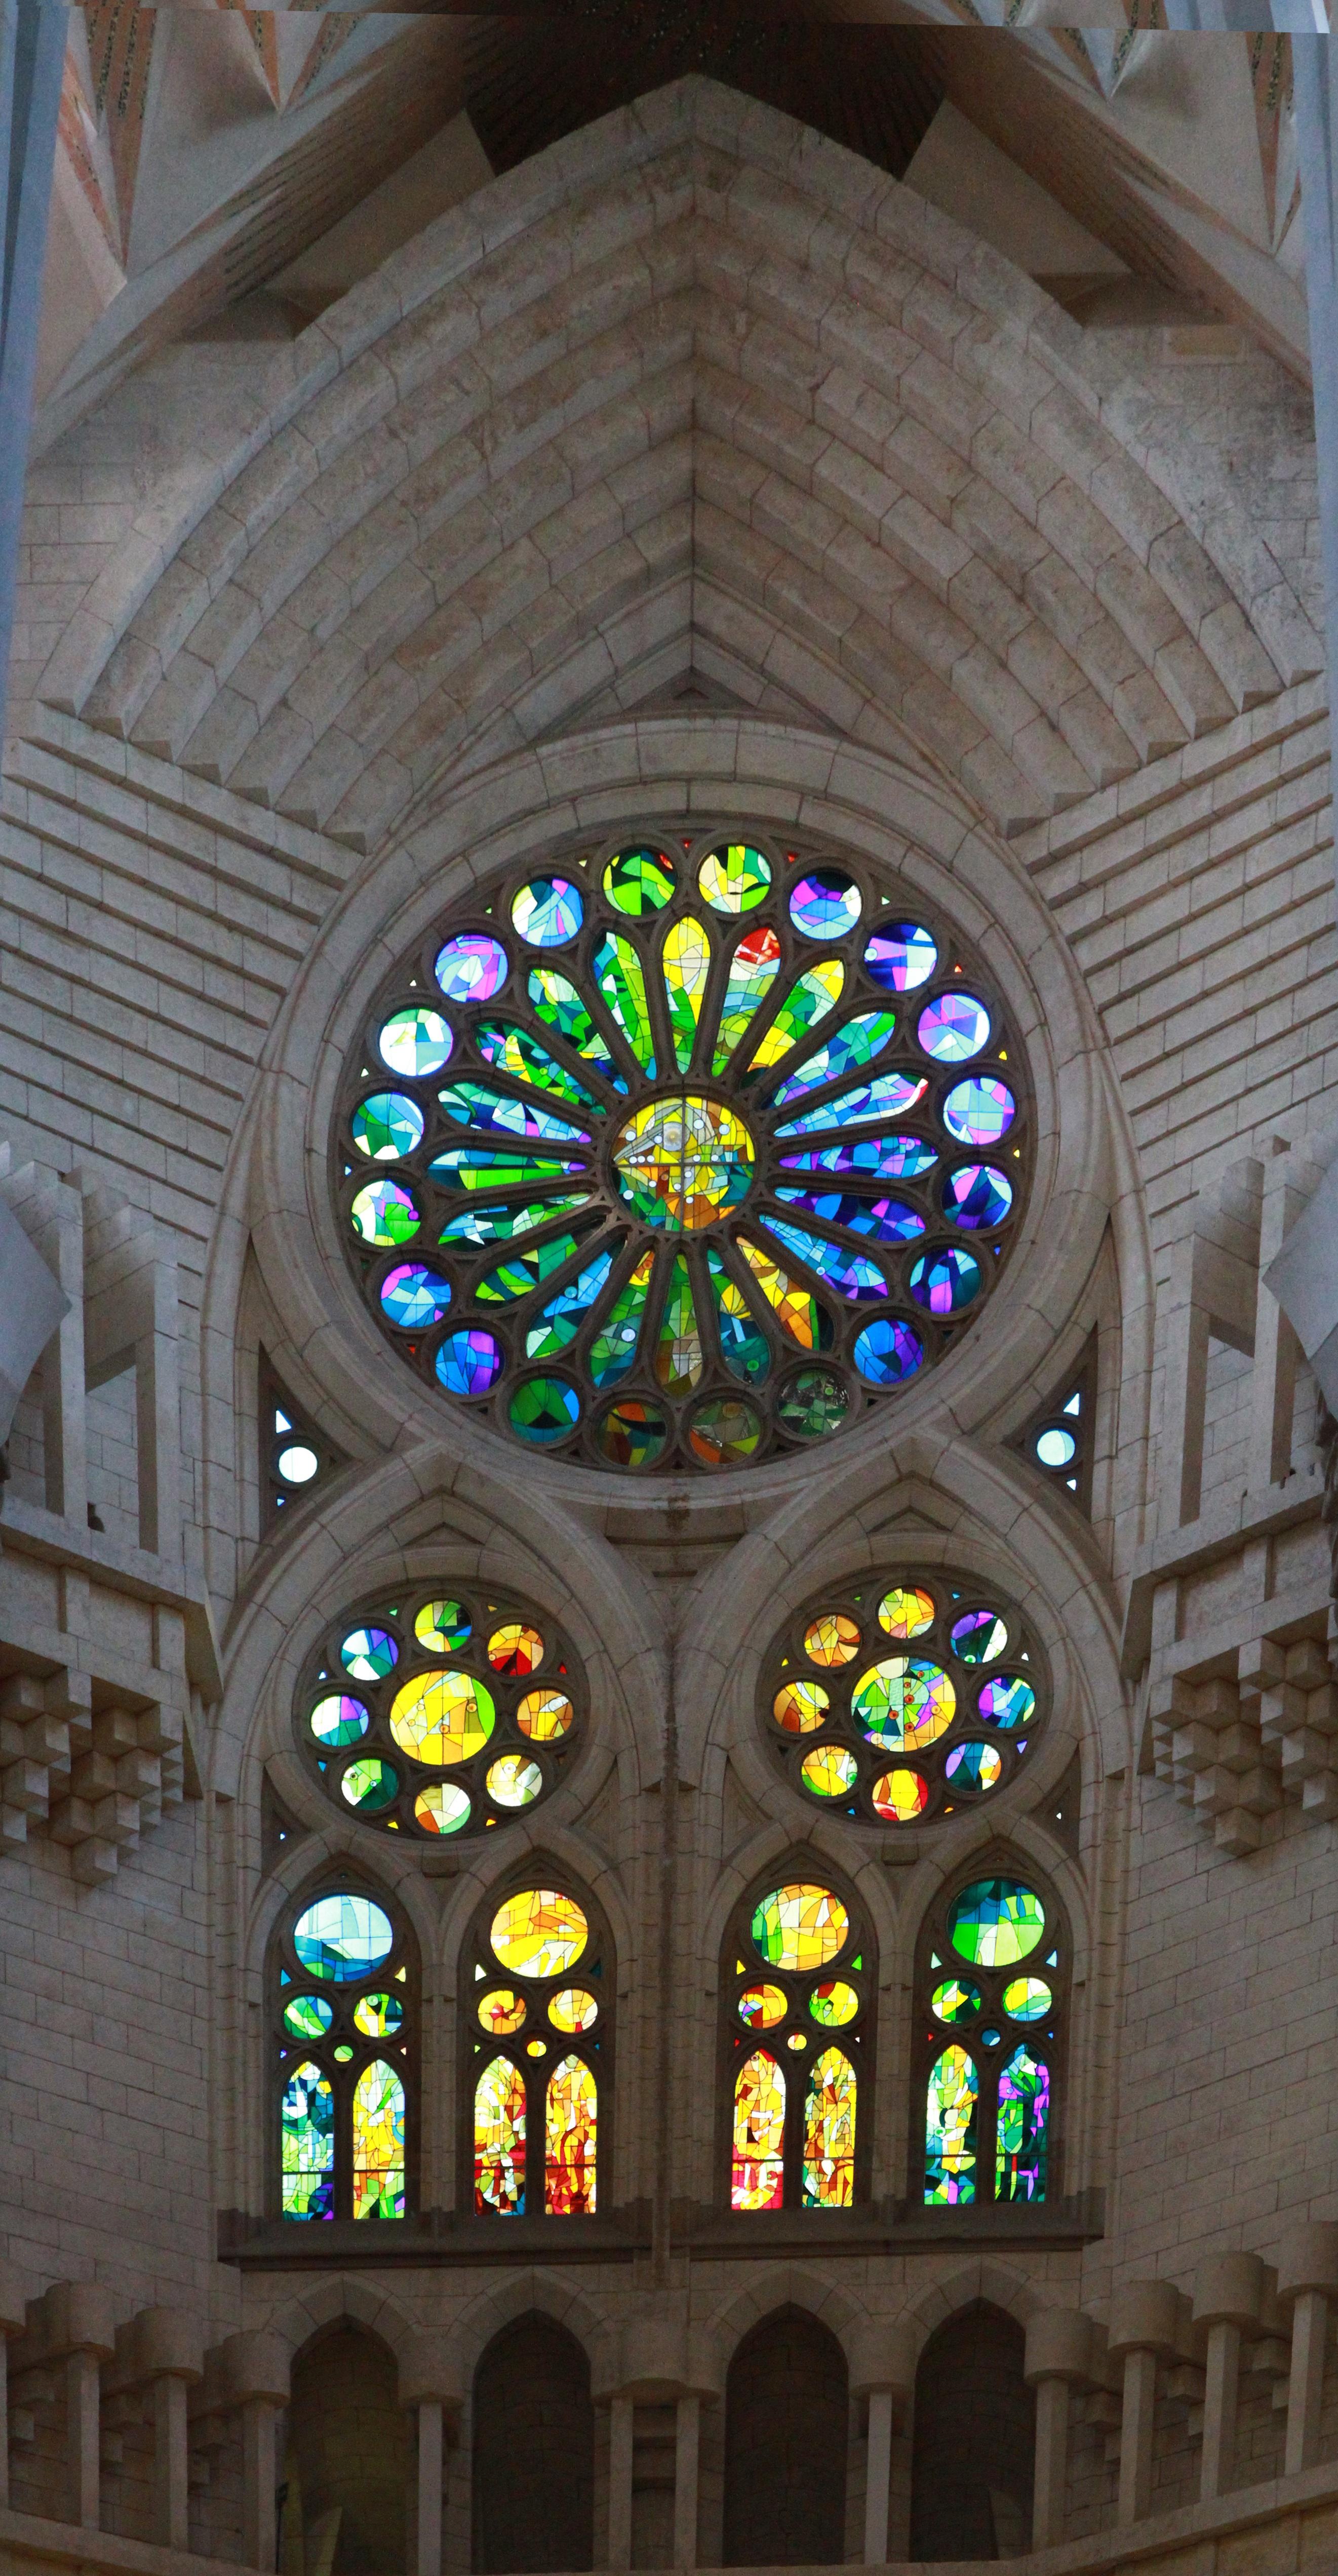 Fotos gratis : ligero, ventana, vaso, edificio, arco, fachada ...